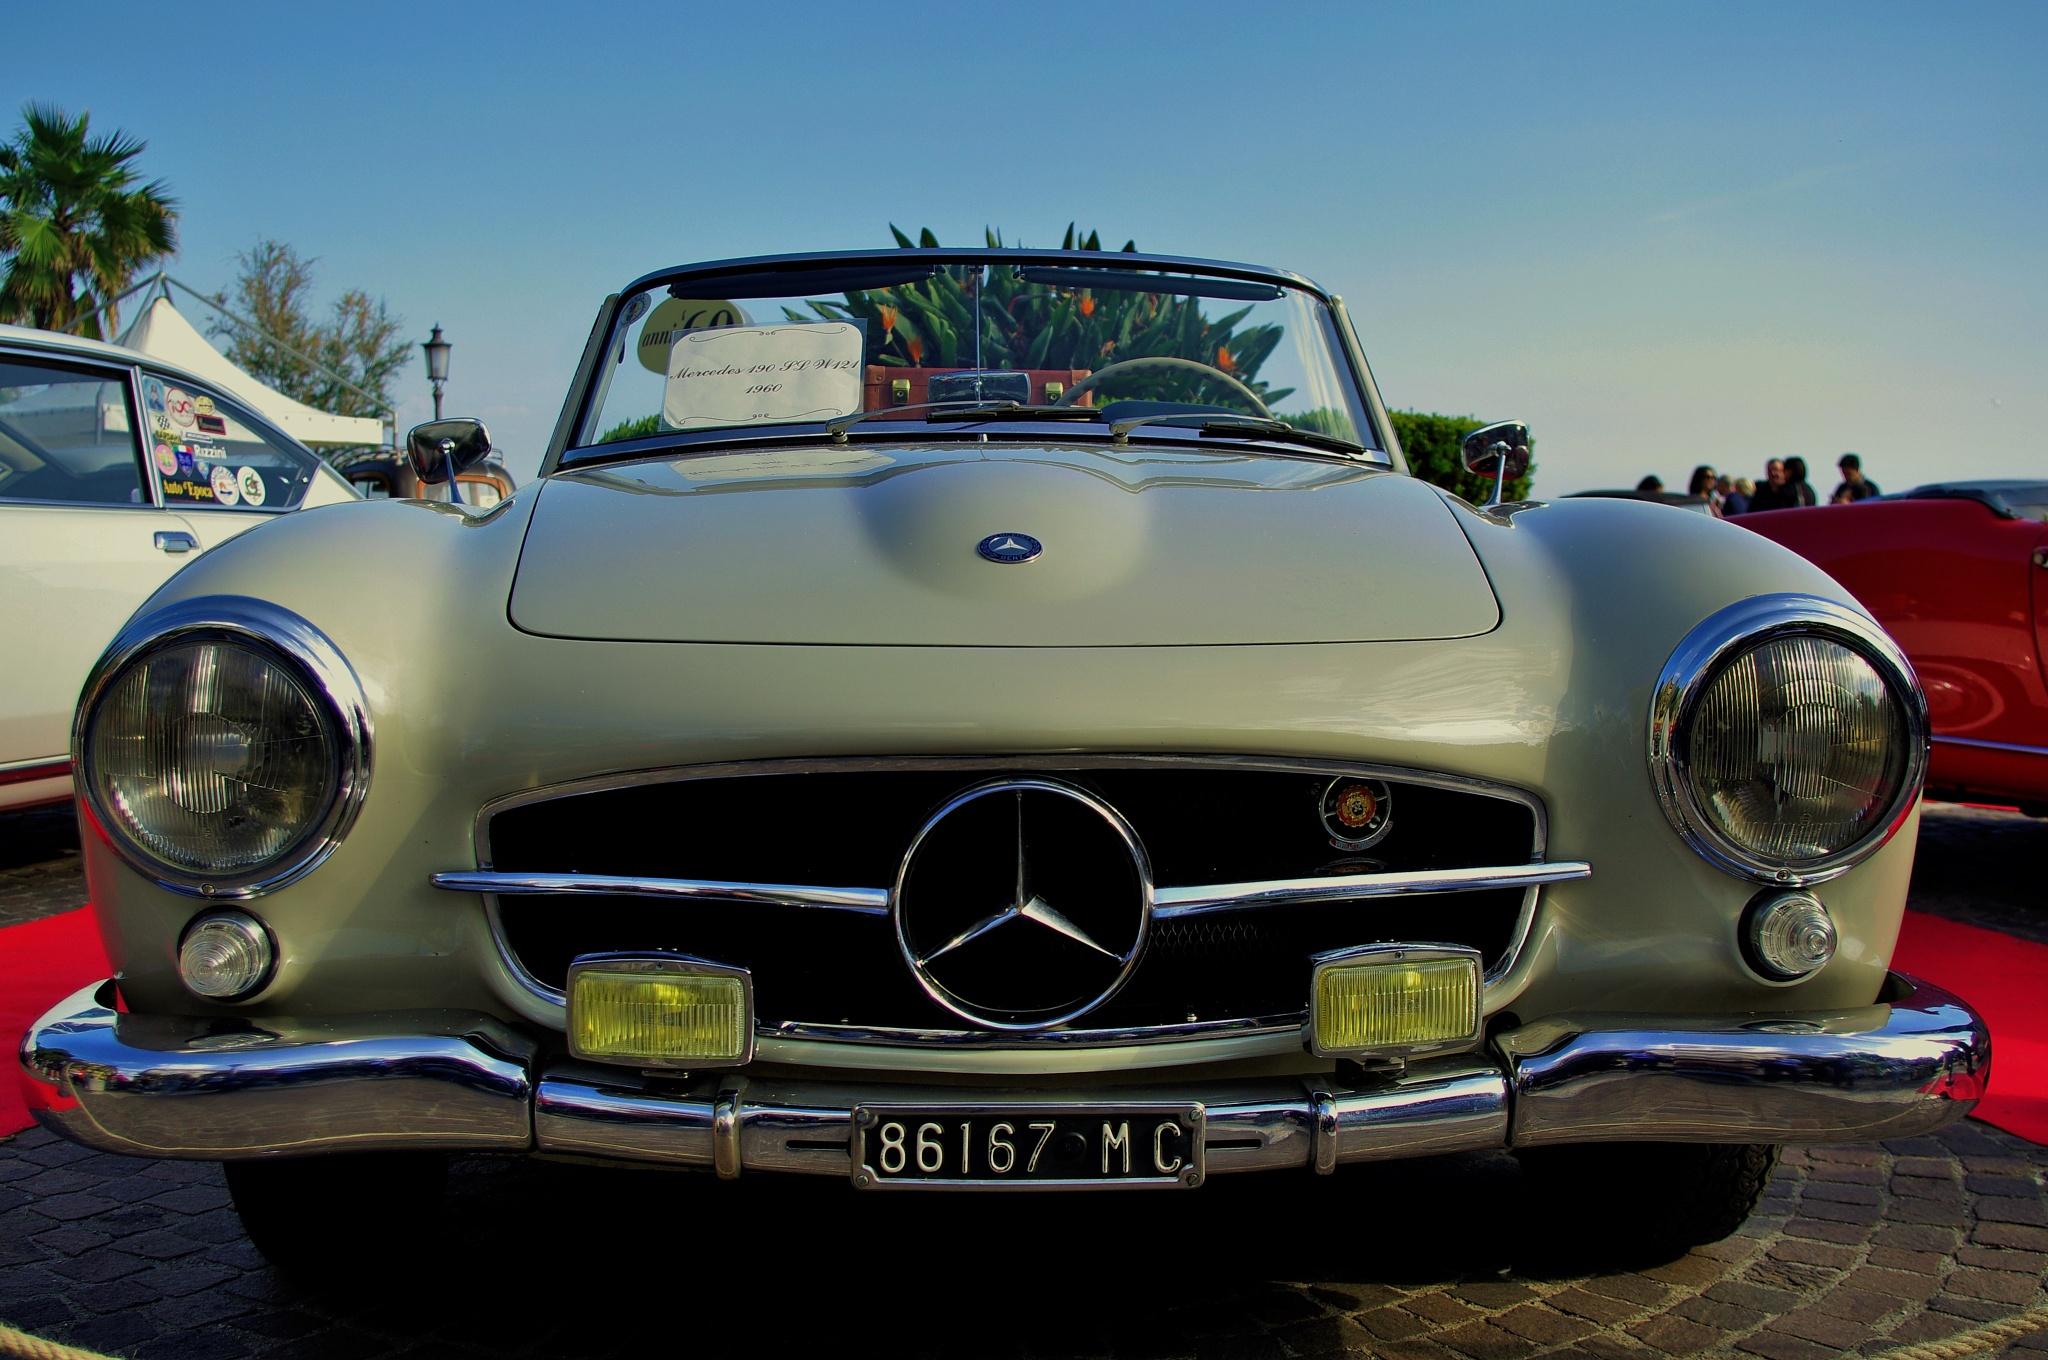 Mercedes 190 (1960) by Giuseppe Valvo